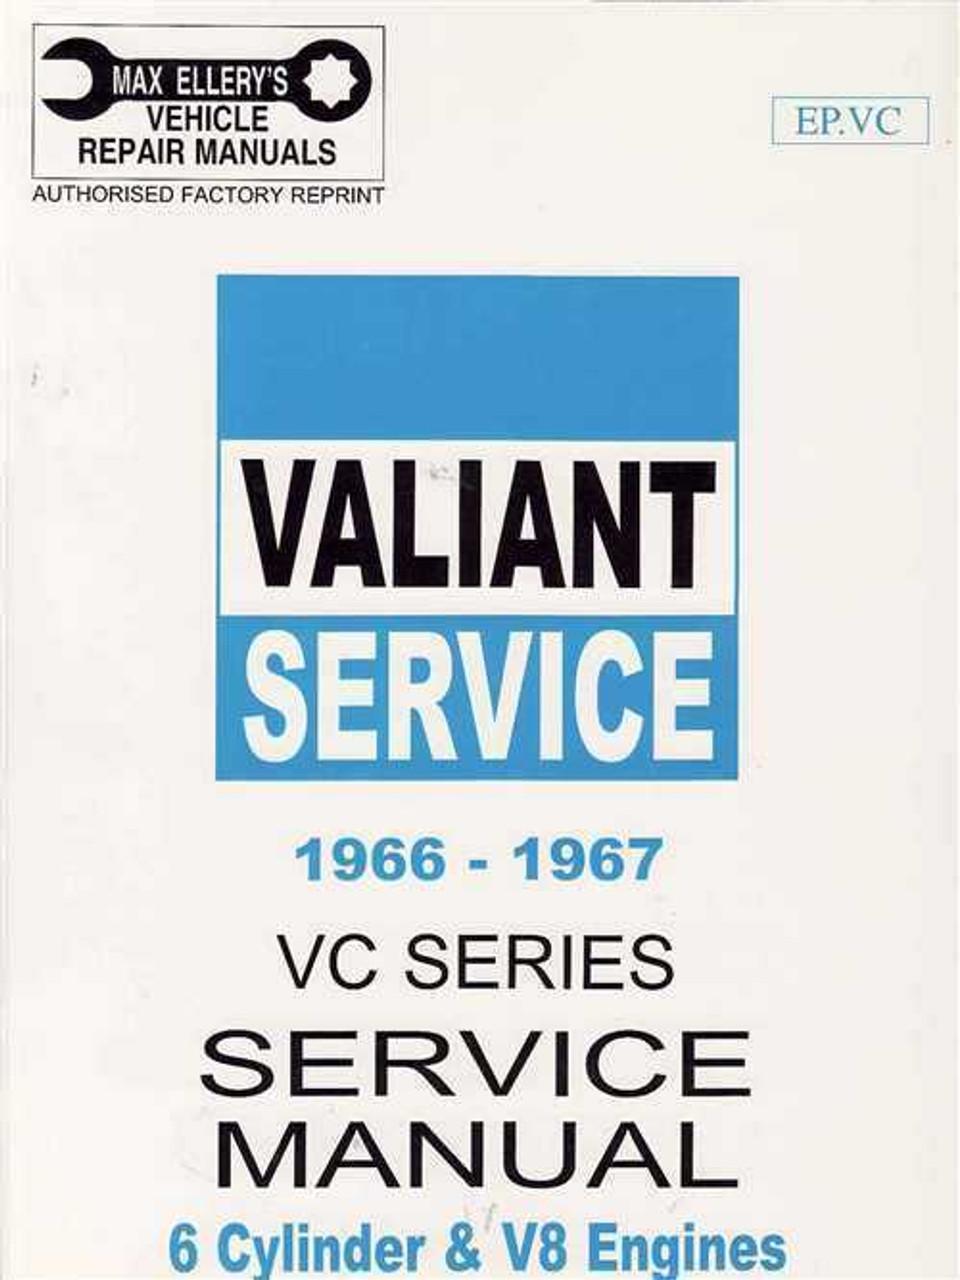 valiant vc series 1966 1967 workshop manual rh automotobookshop com au vc valiant workshop manual download vc valiant workshop manual download